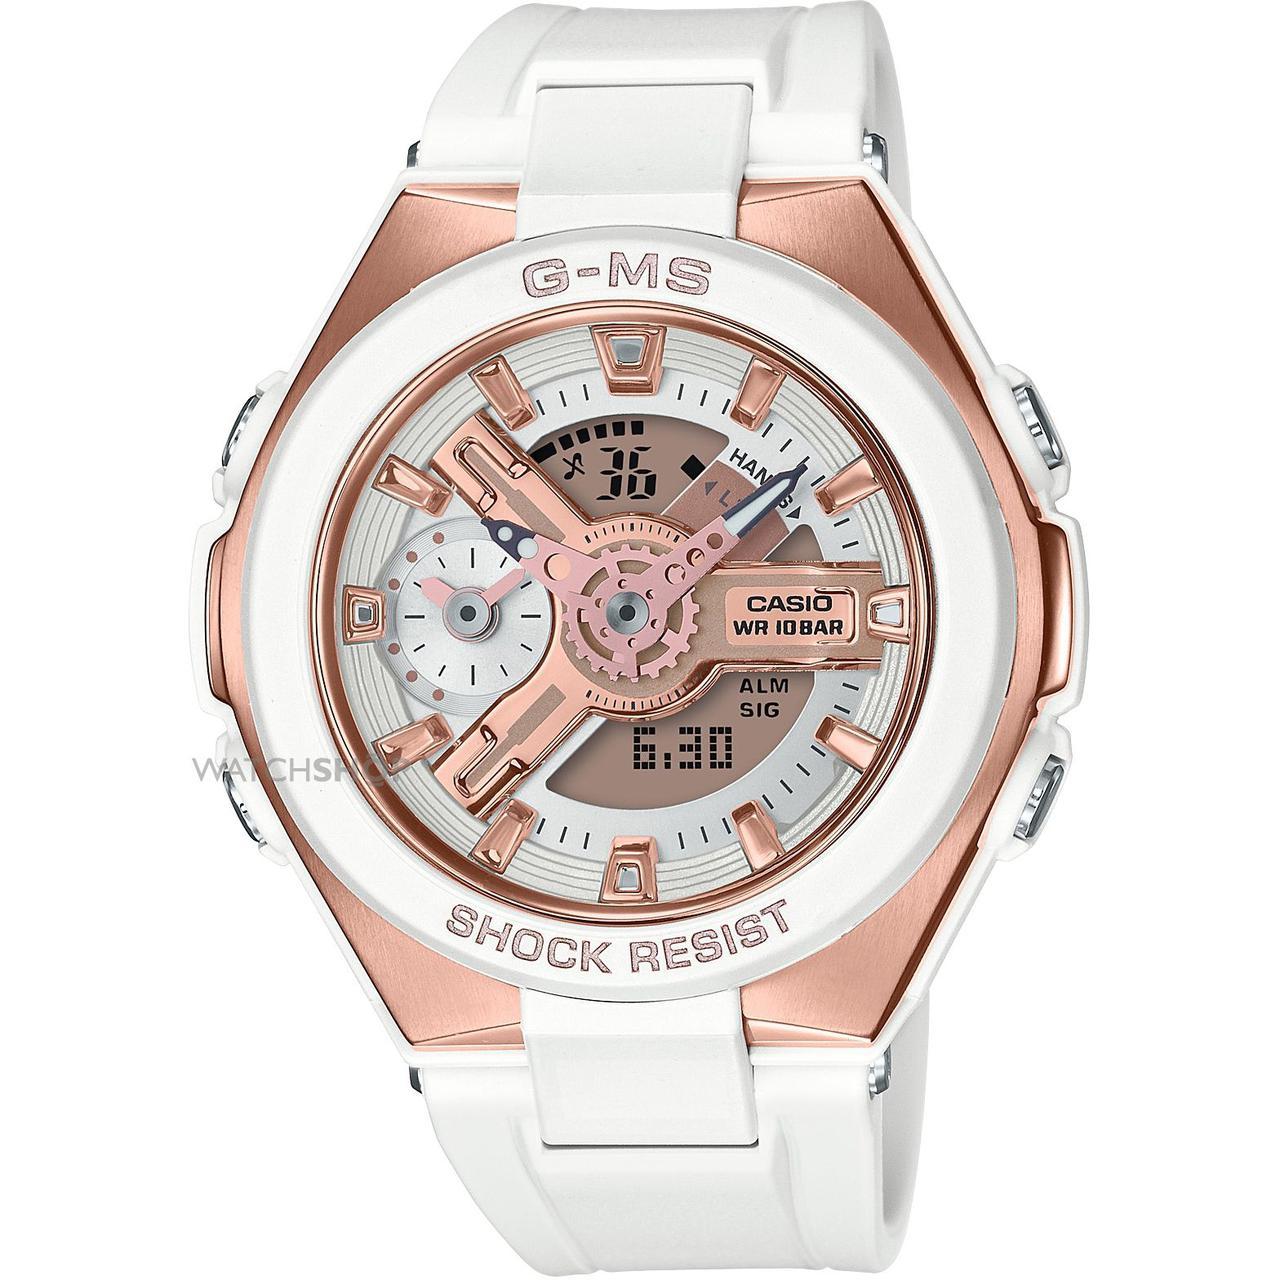 Женские часы Casio MSG-400G-7AER